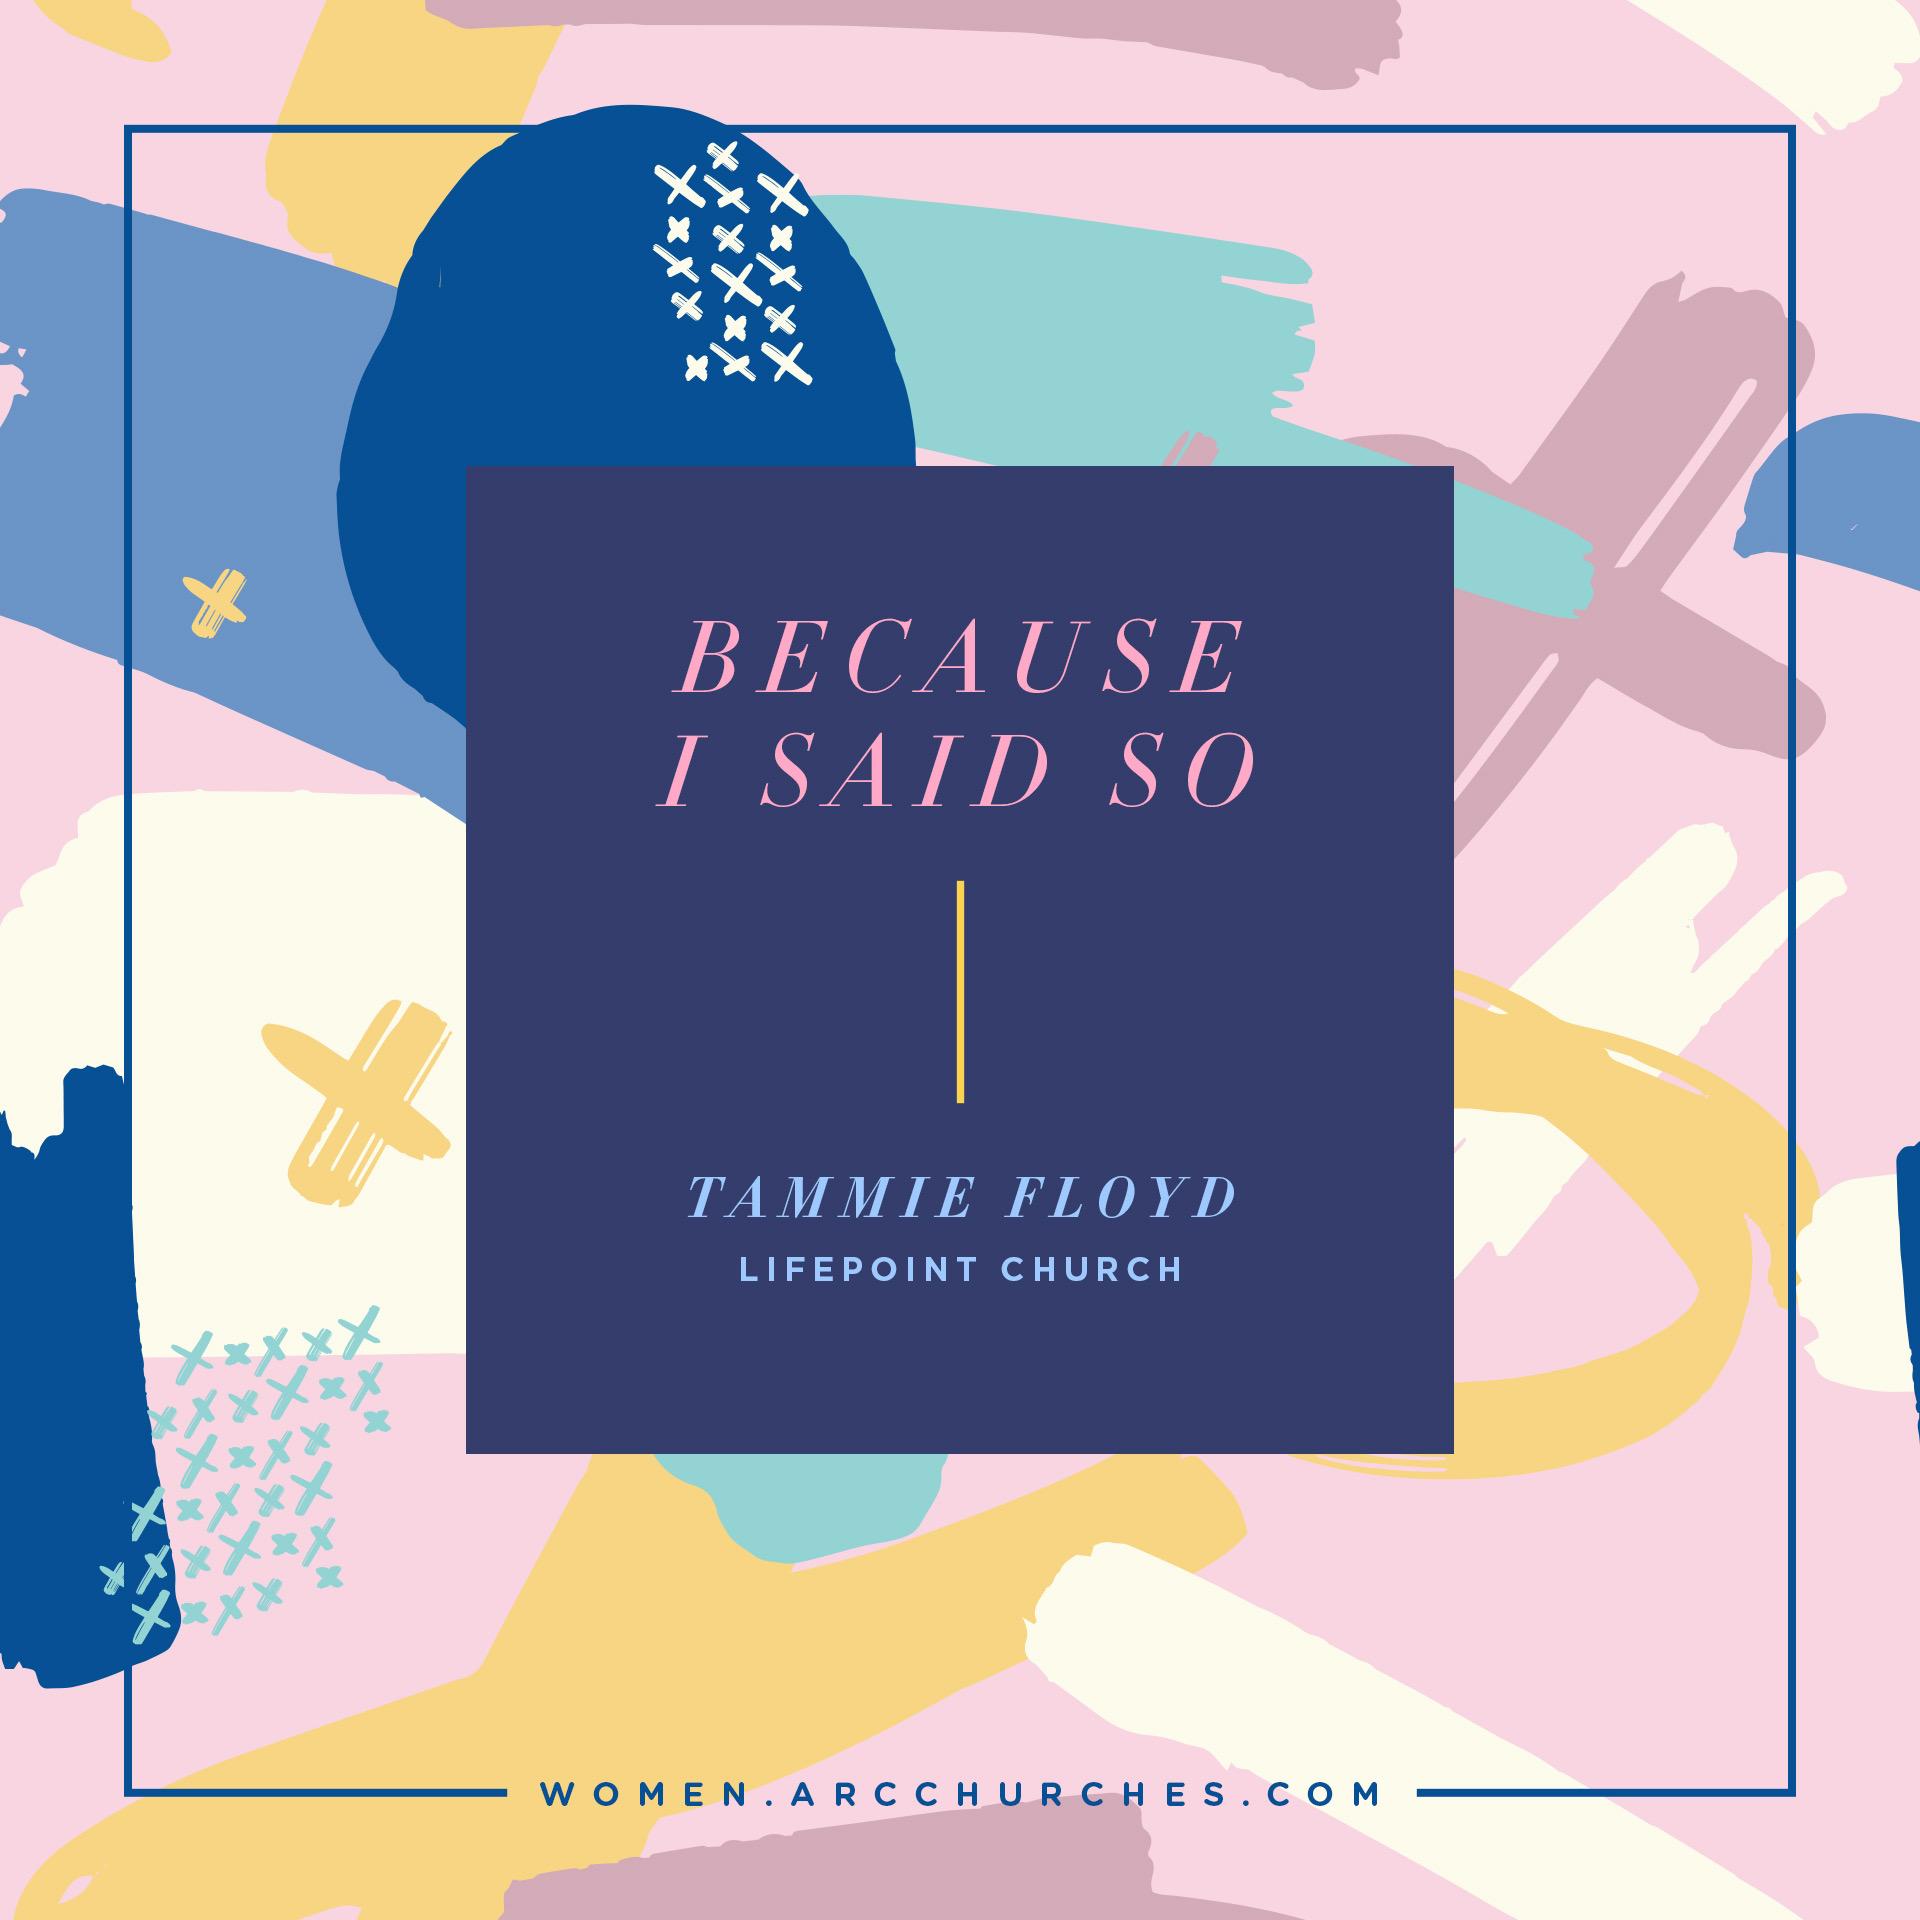 Tammie Floyd